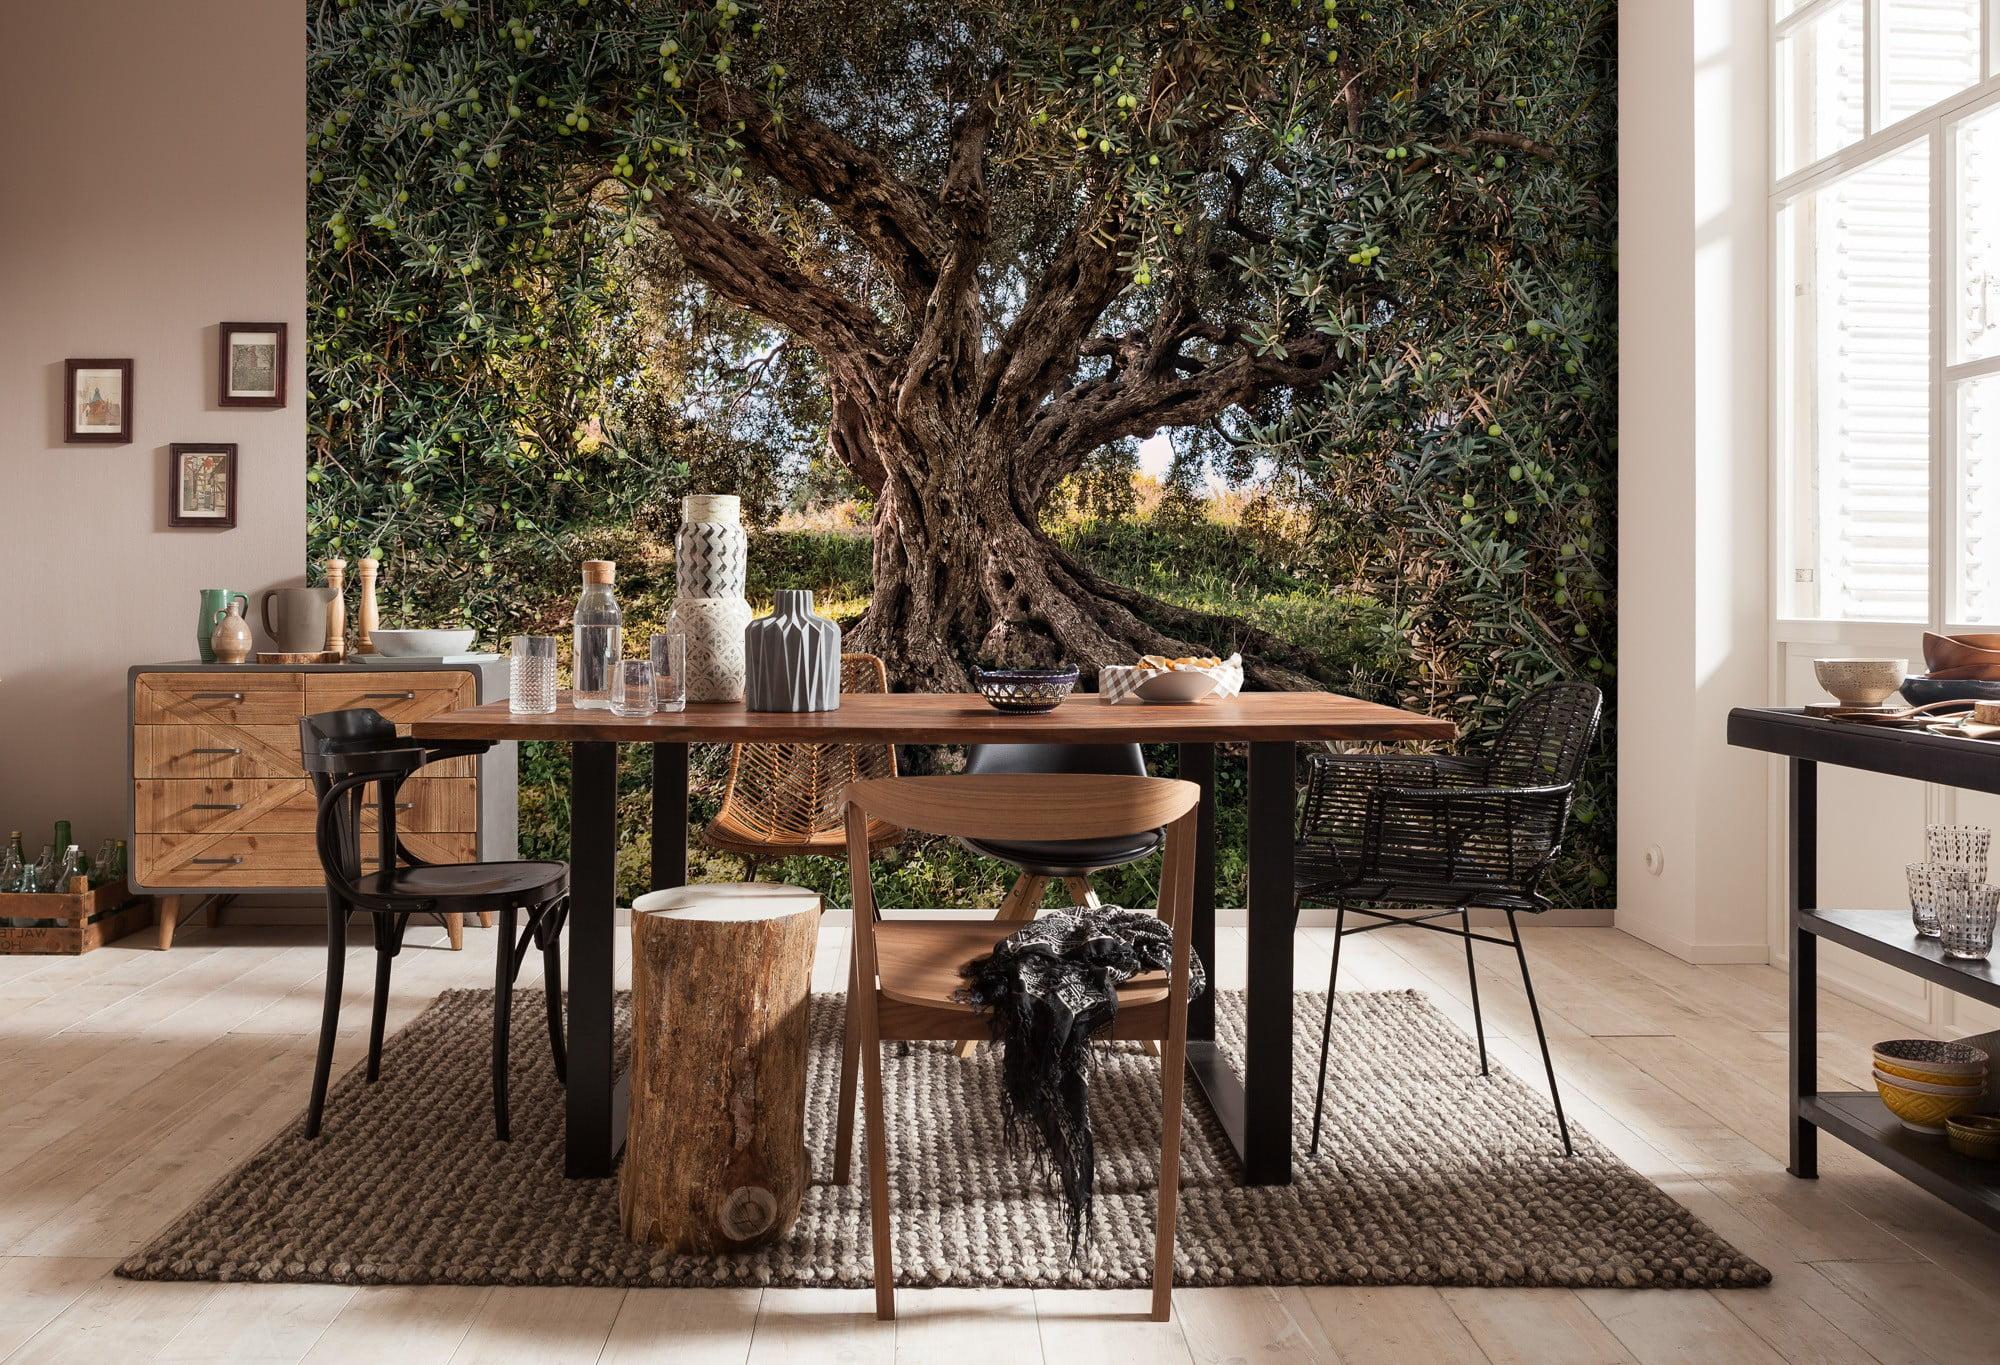 Komar Fotobehang Behang.Foto Behang Olive Tree 8 531